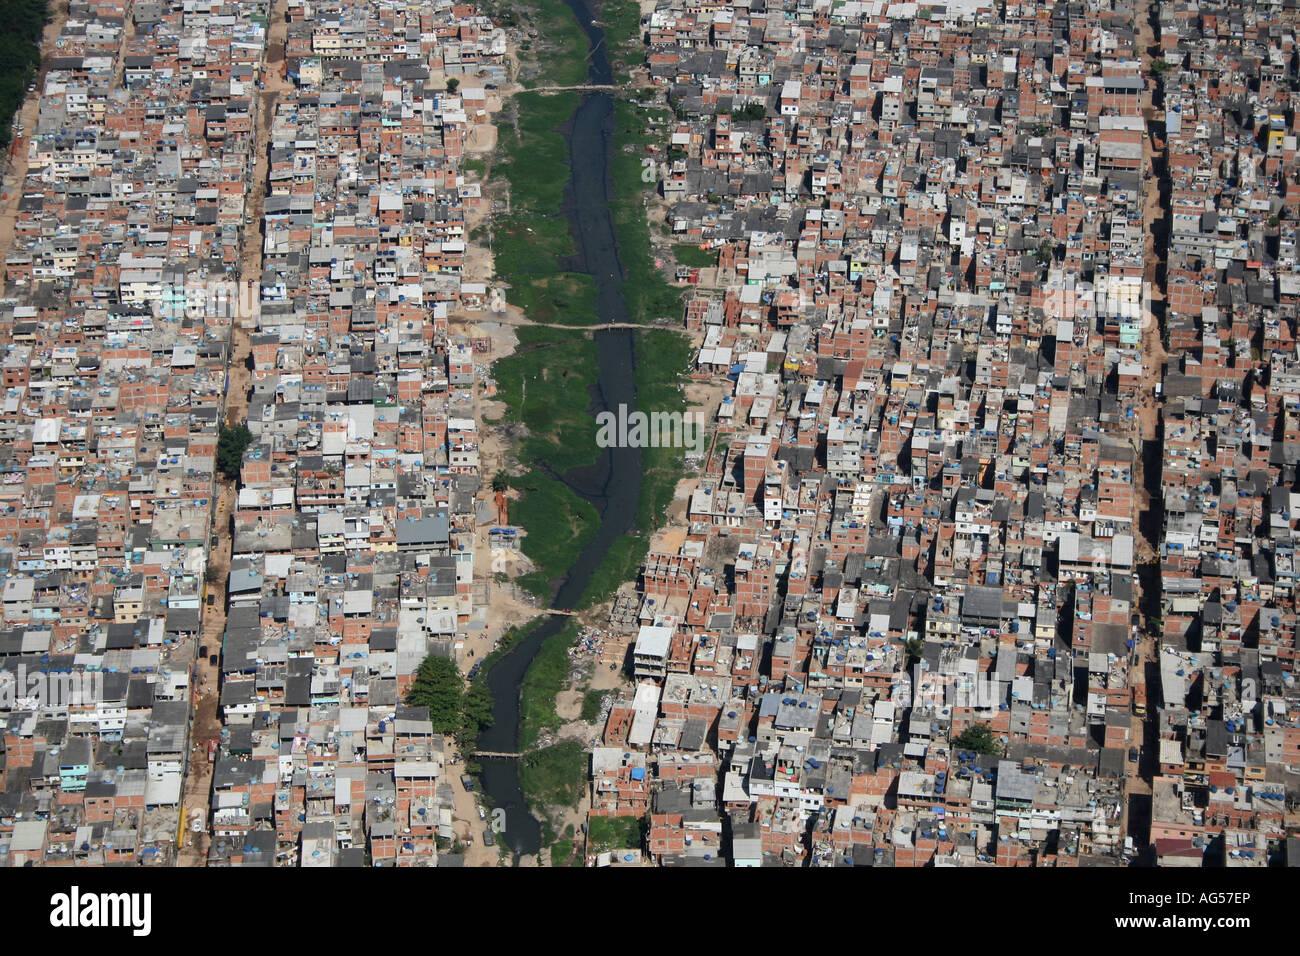 Risultati immagini per RIO A FAVELA CIDADE DE DEUS?